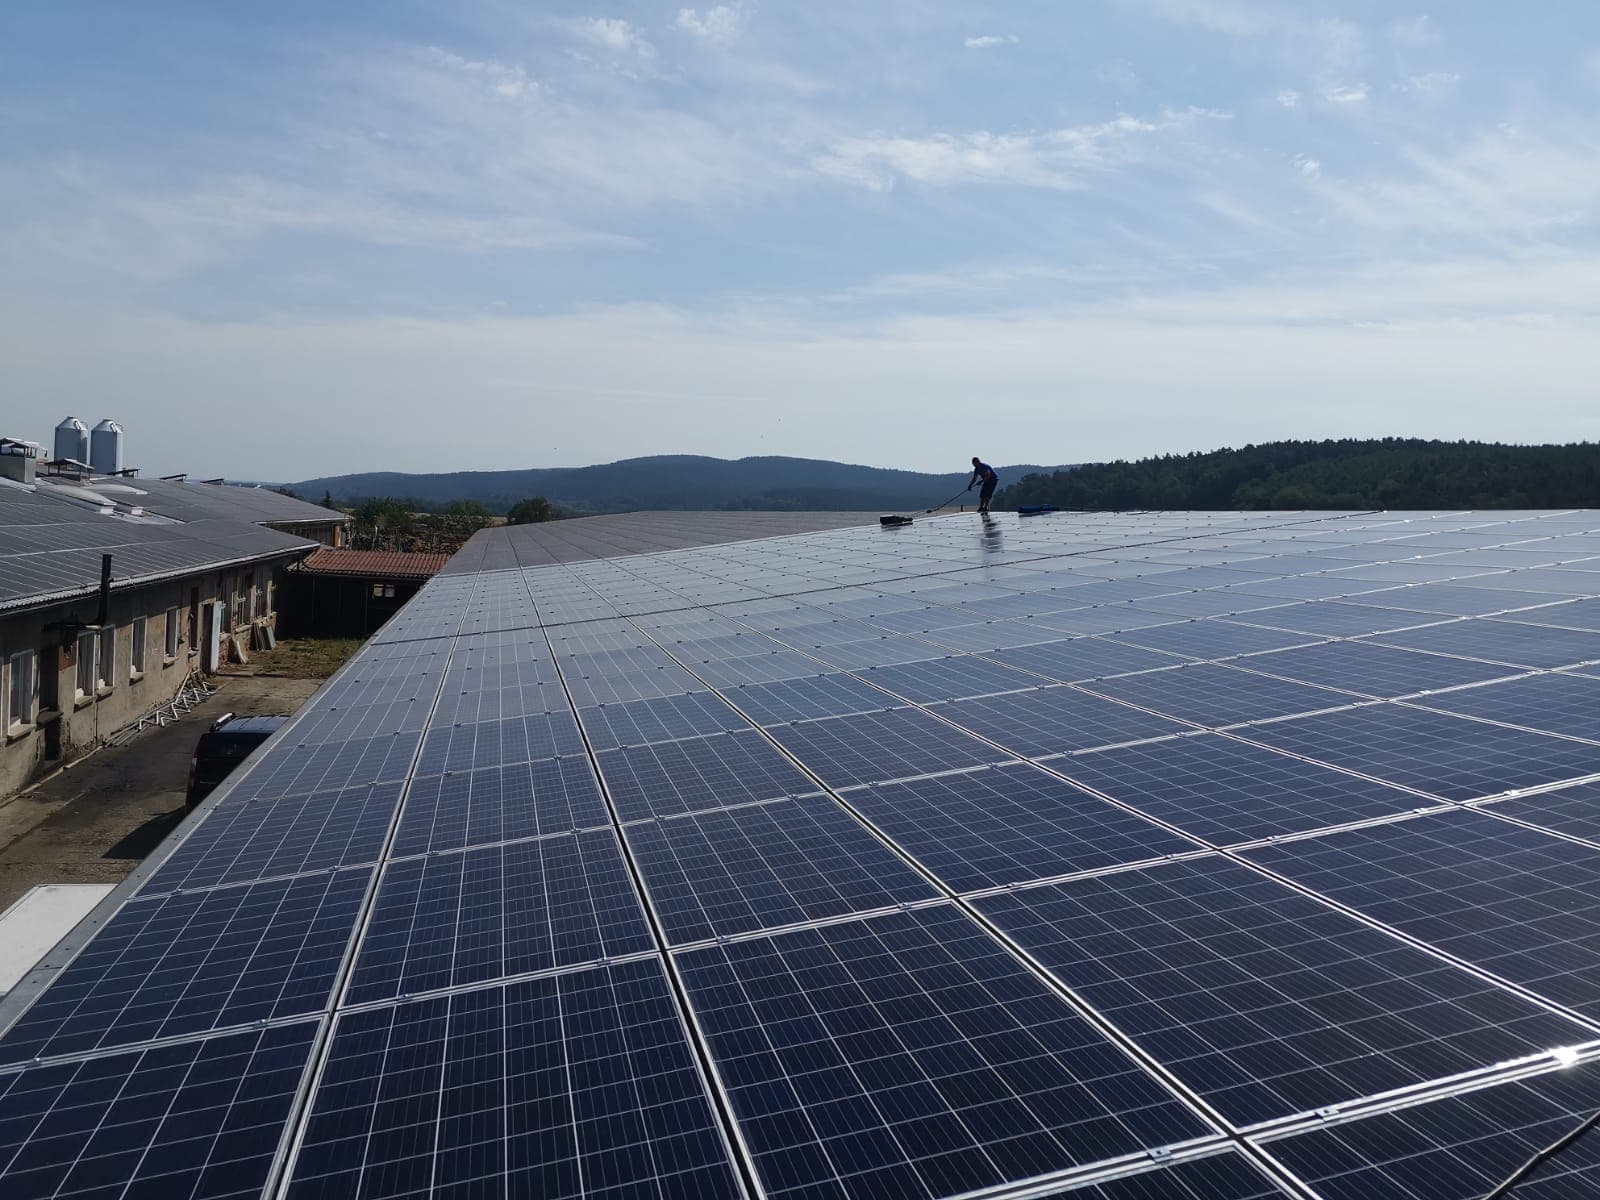 Solarreinigung in jena